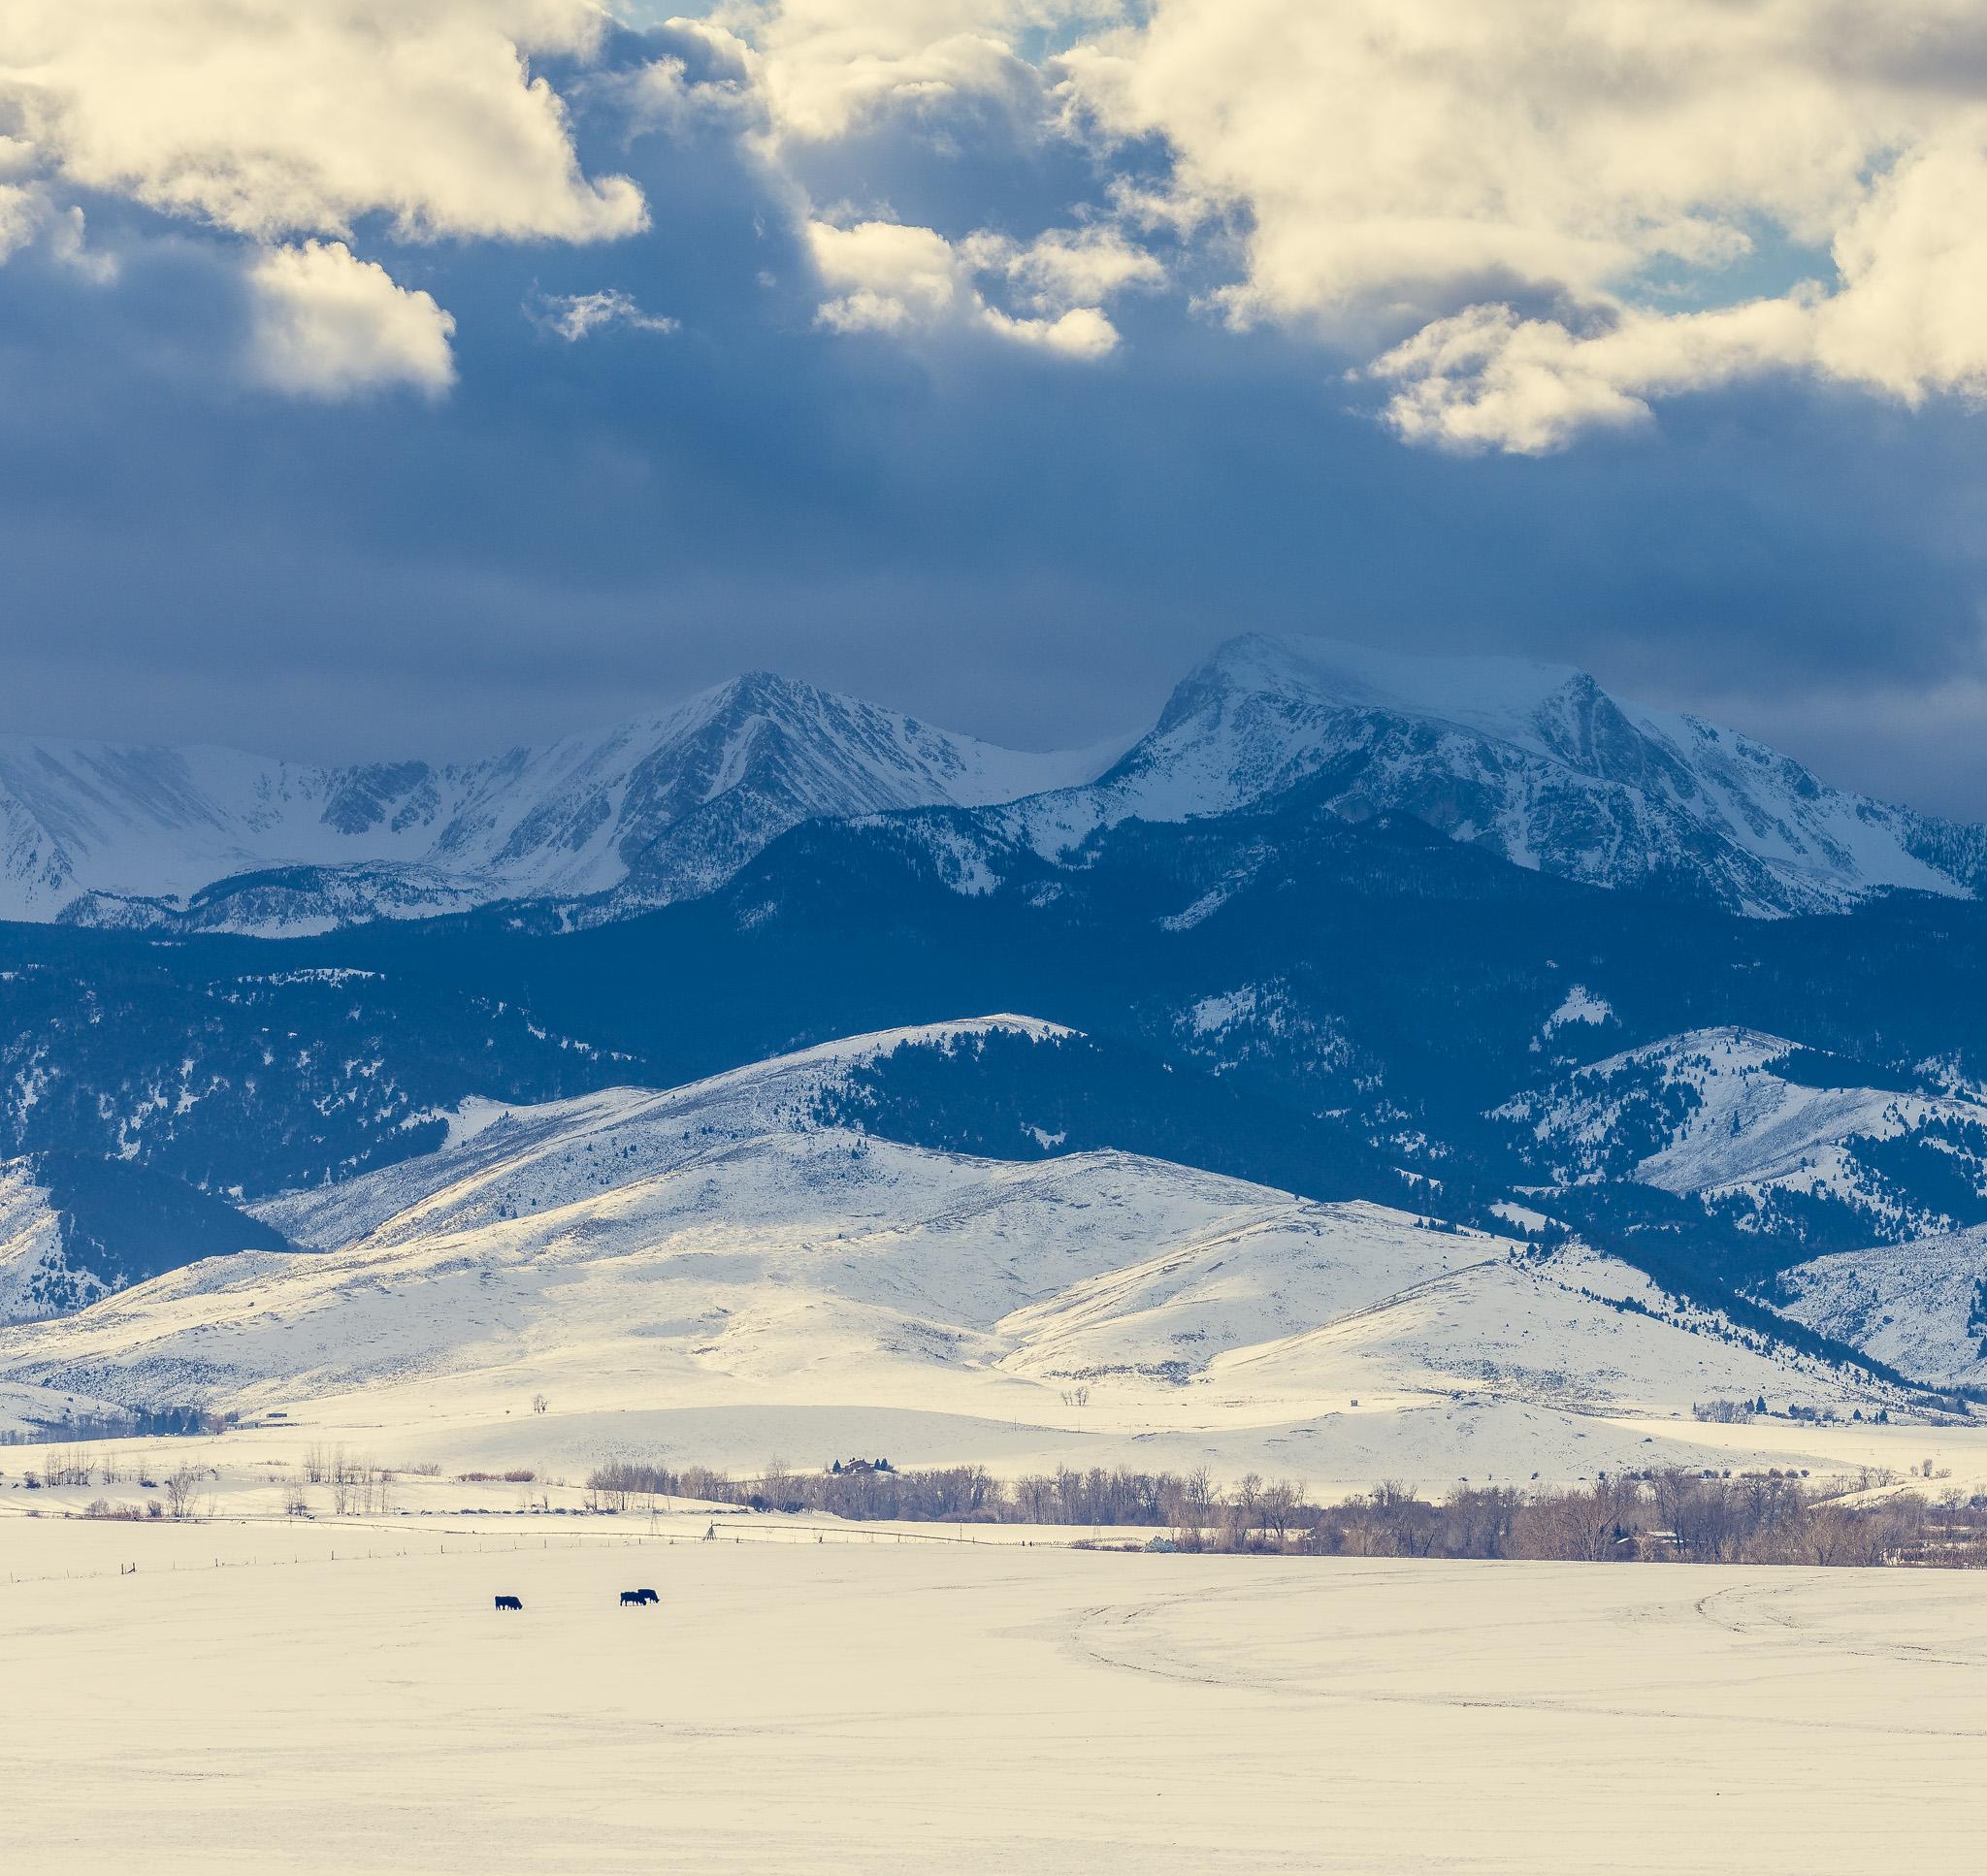 montana mountains-03-Jan2018 (1 of 1).jpg